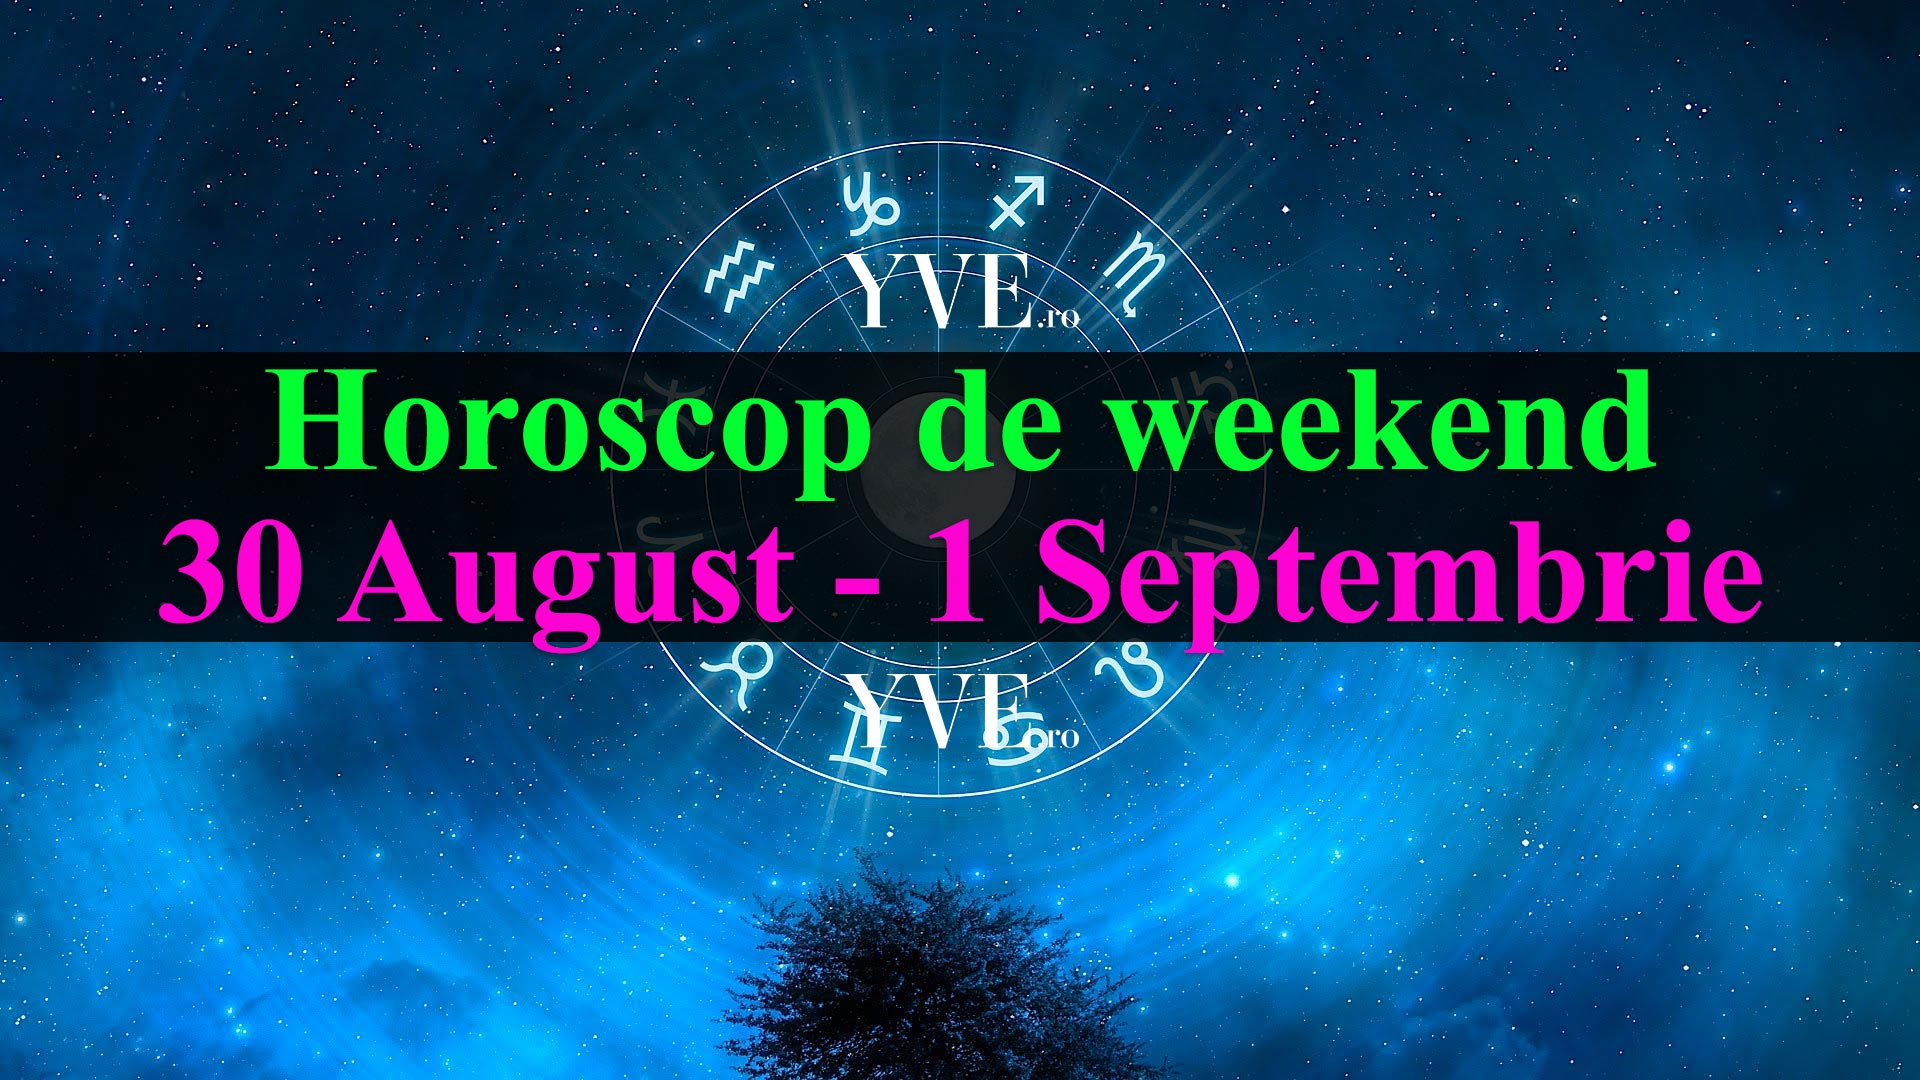 Horoscop de weekend 30 August - 1 Septembrie 2019